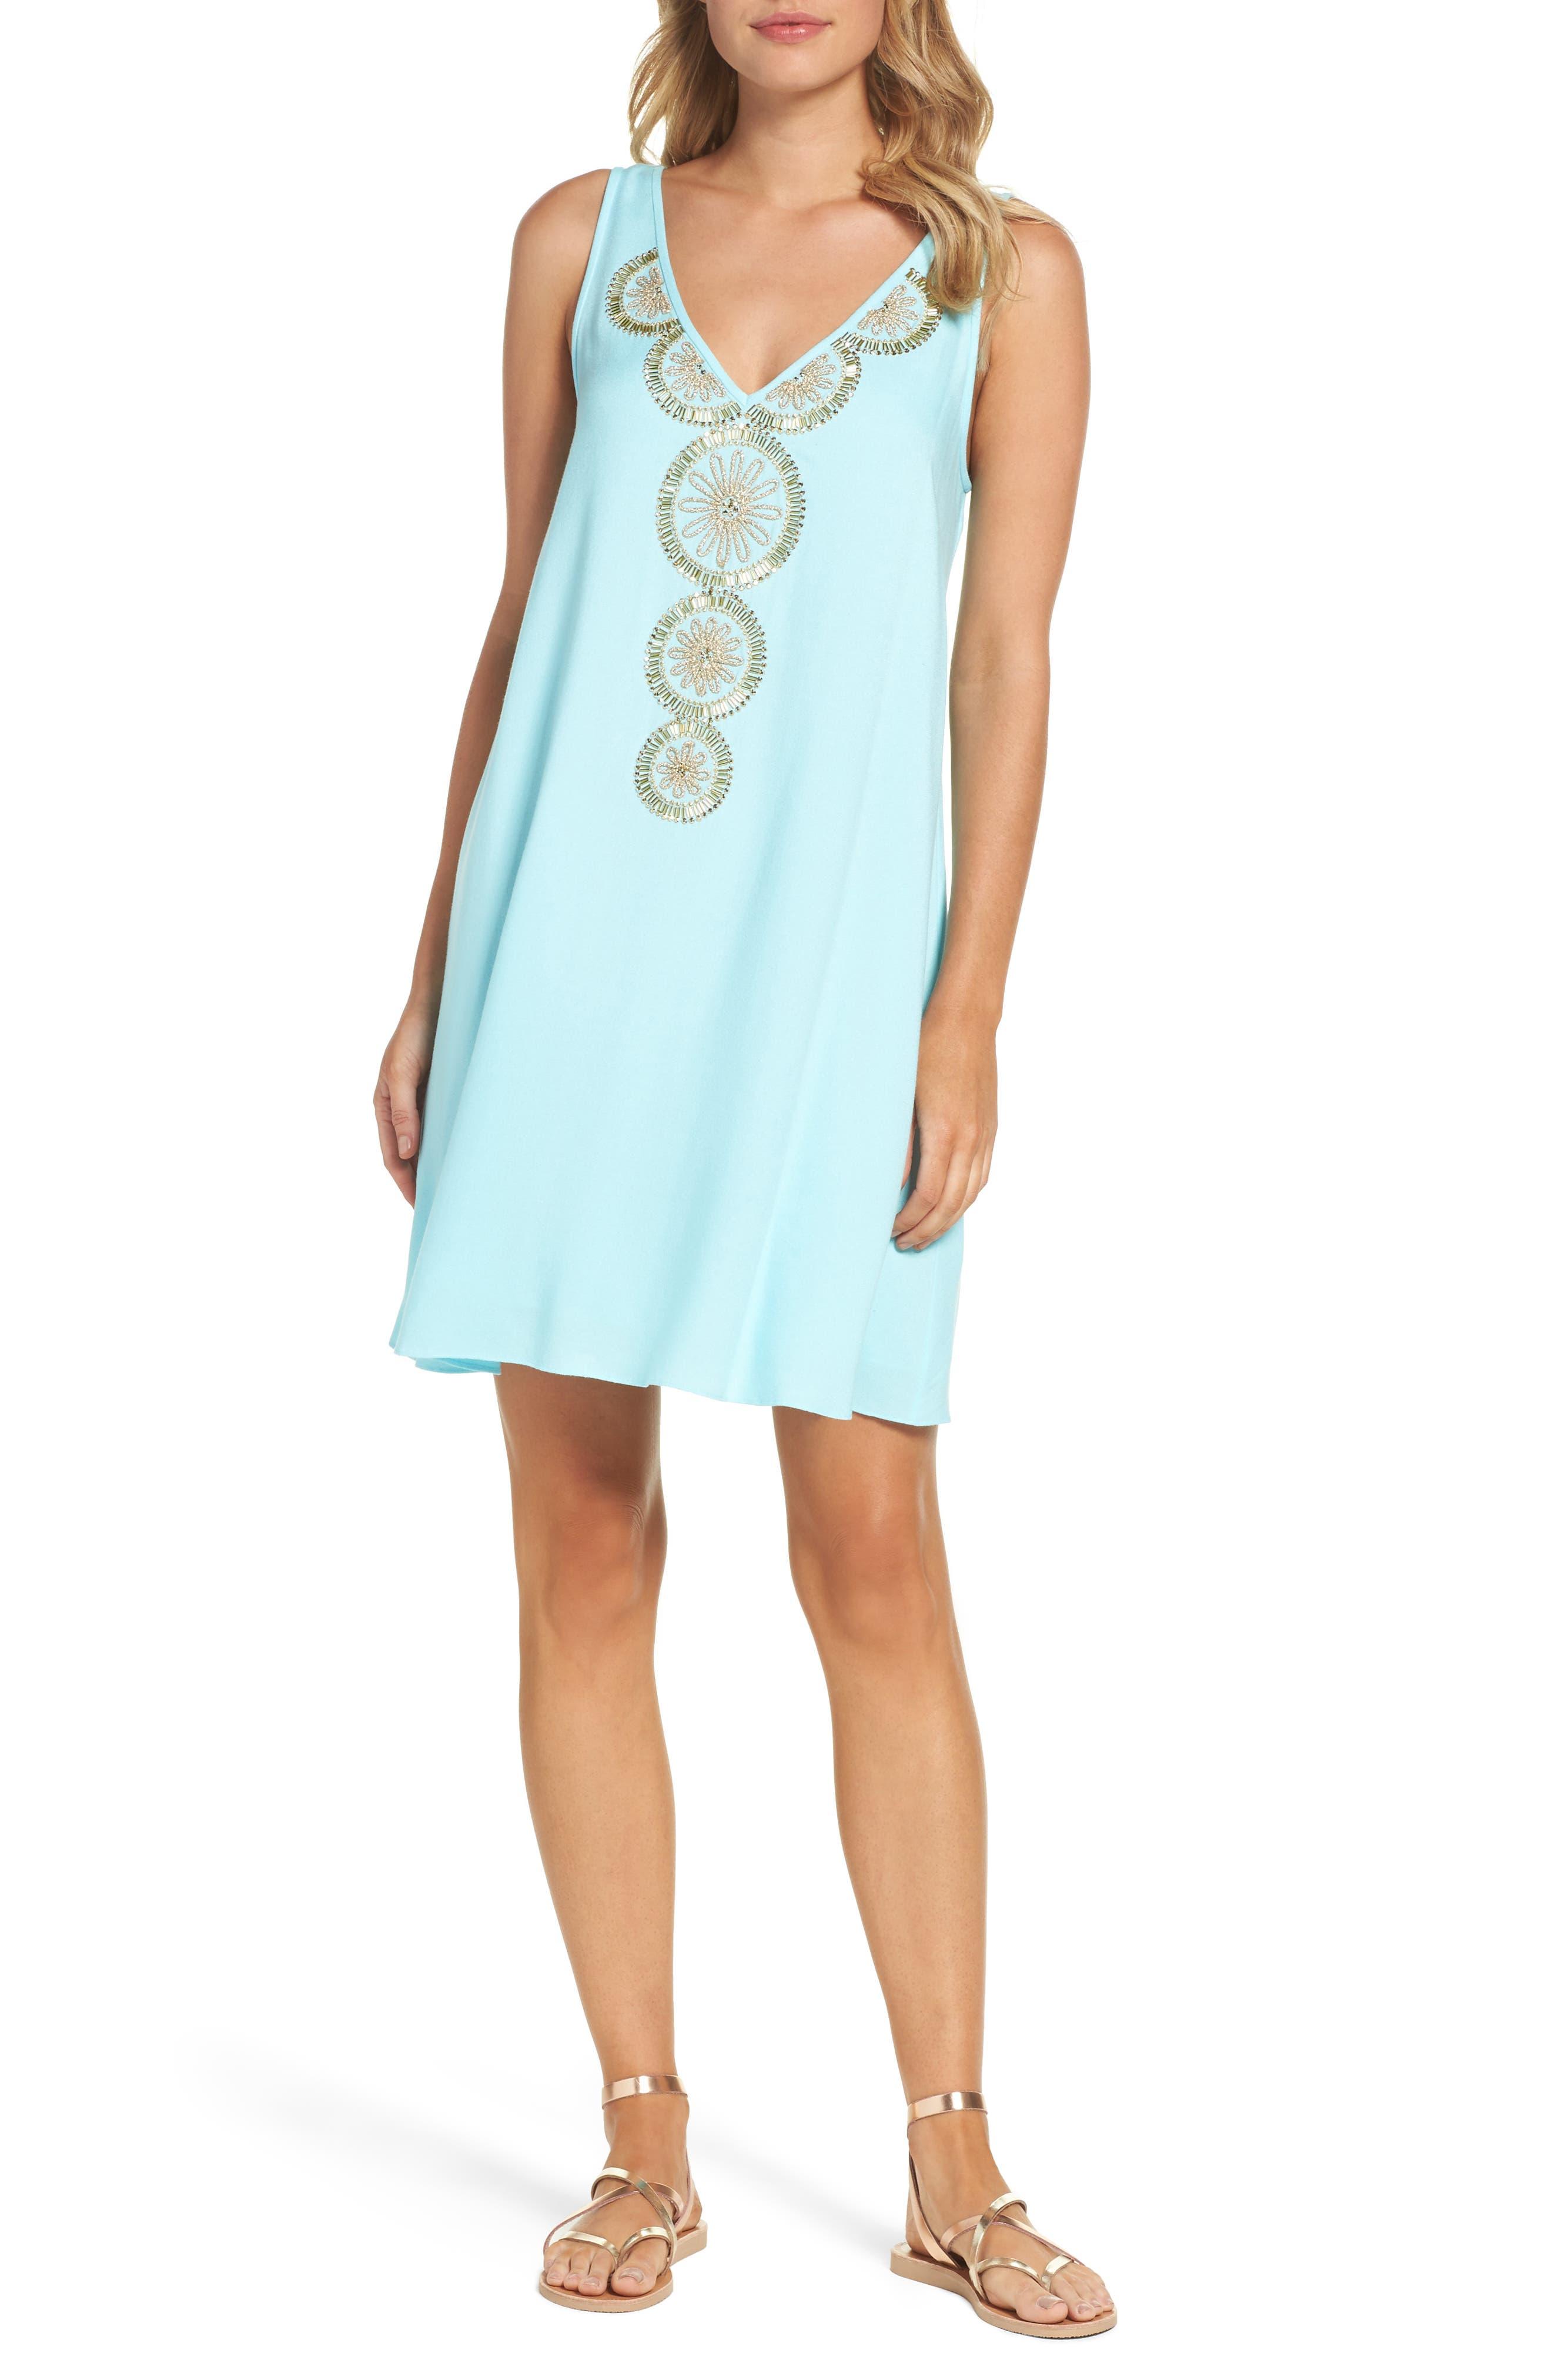 Main Image - Lilly Pulitzer® Fia Swing Dress